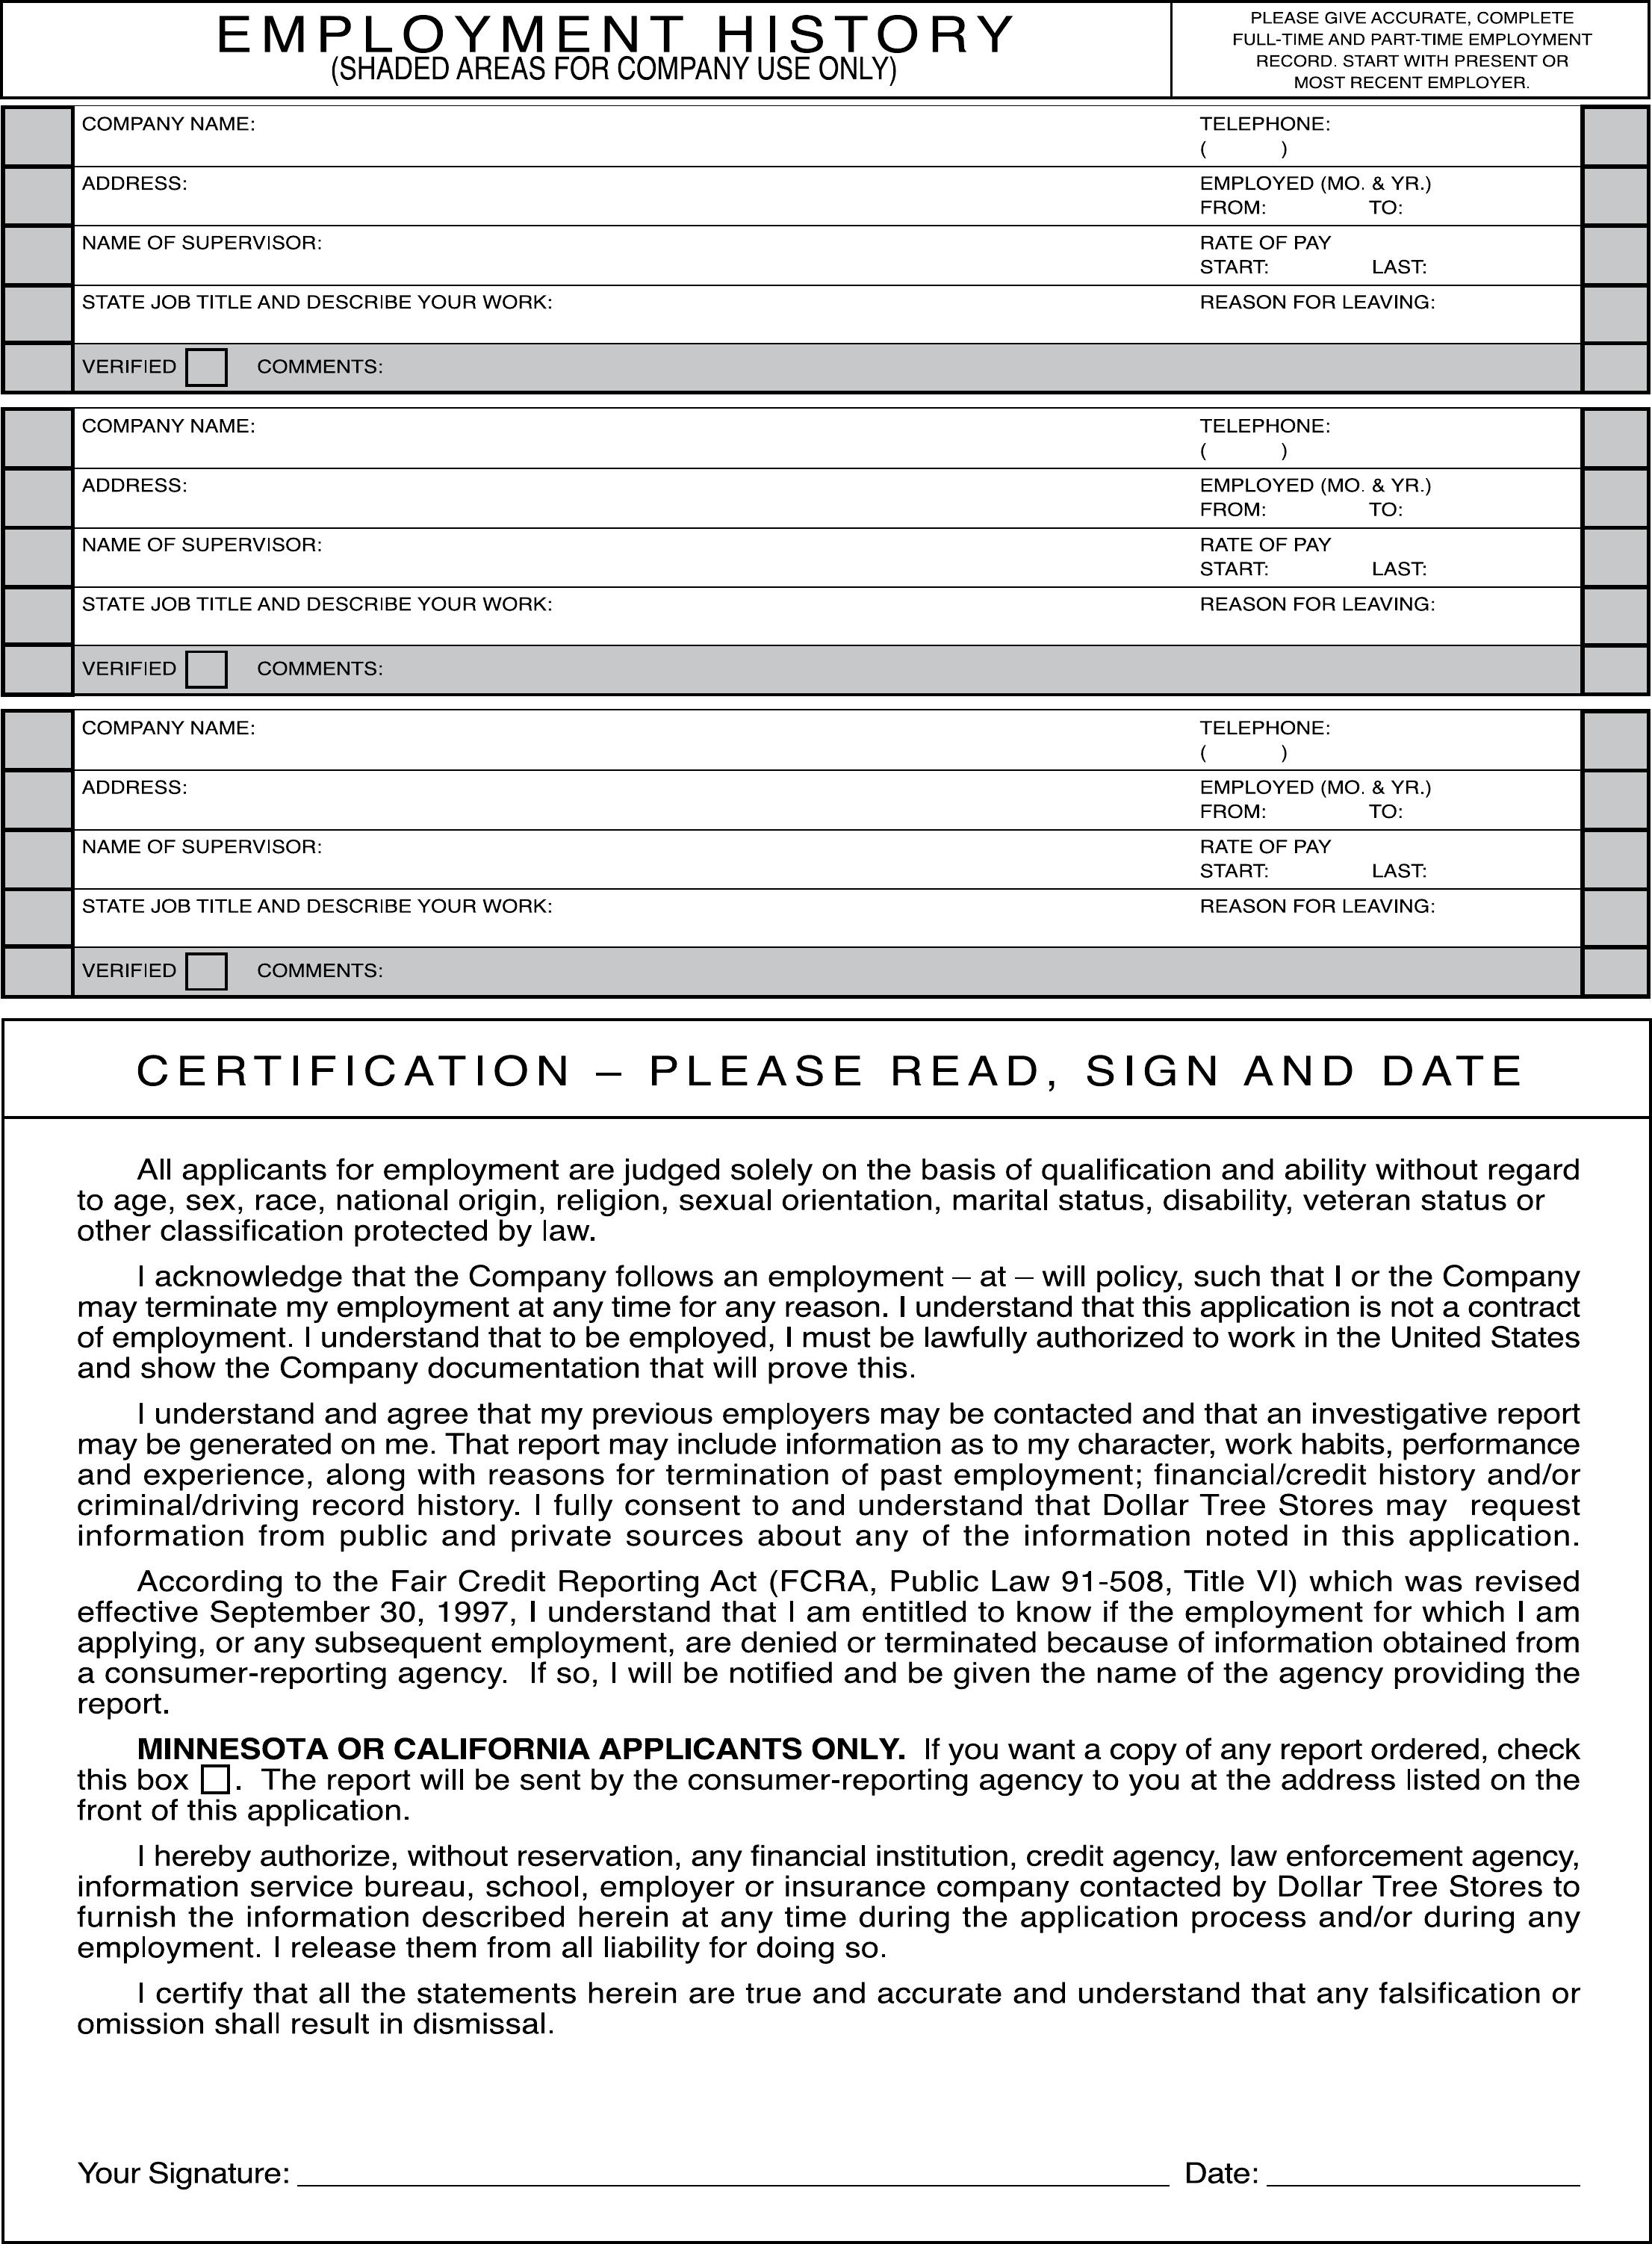 Dollar Tree Job Application Dollar Tree Job Application Form To - Free Printable Dollar Tree Application Form